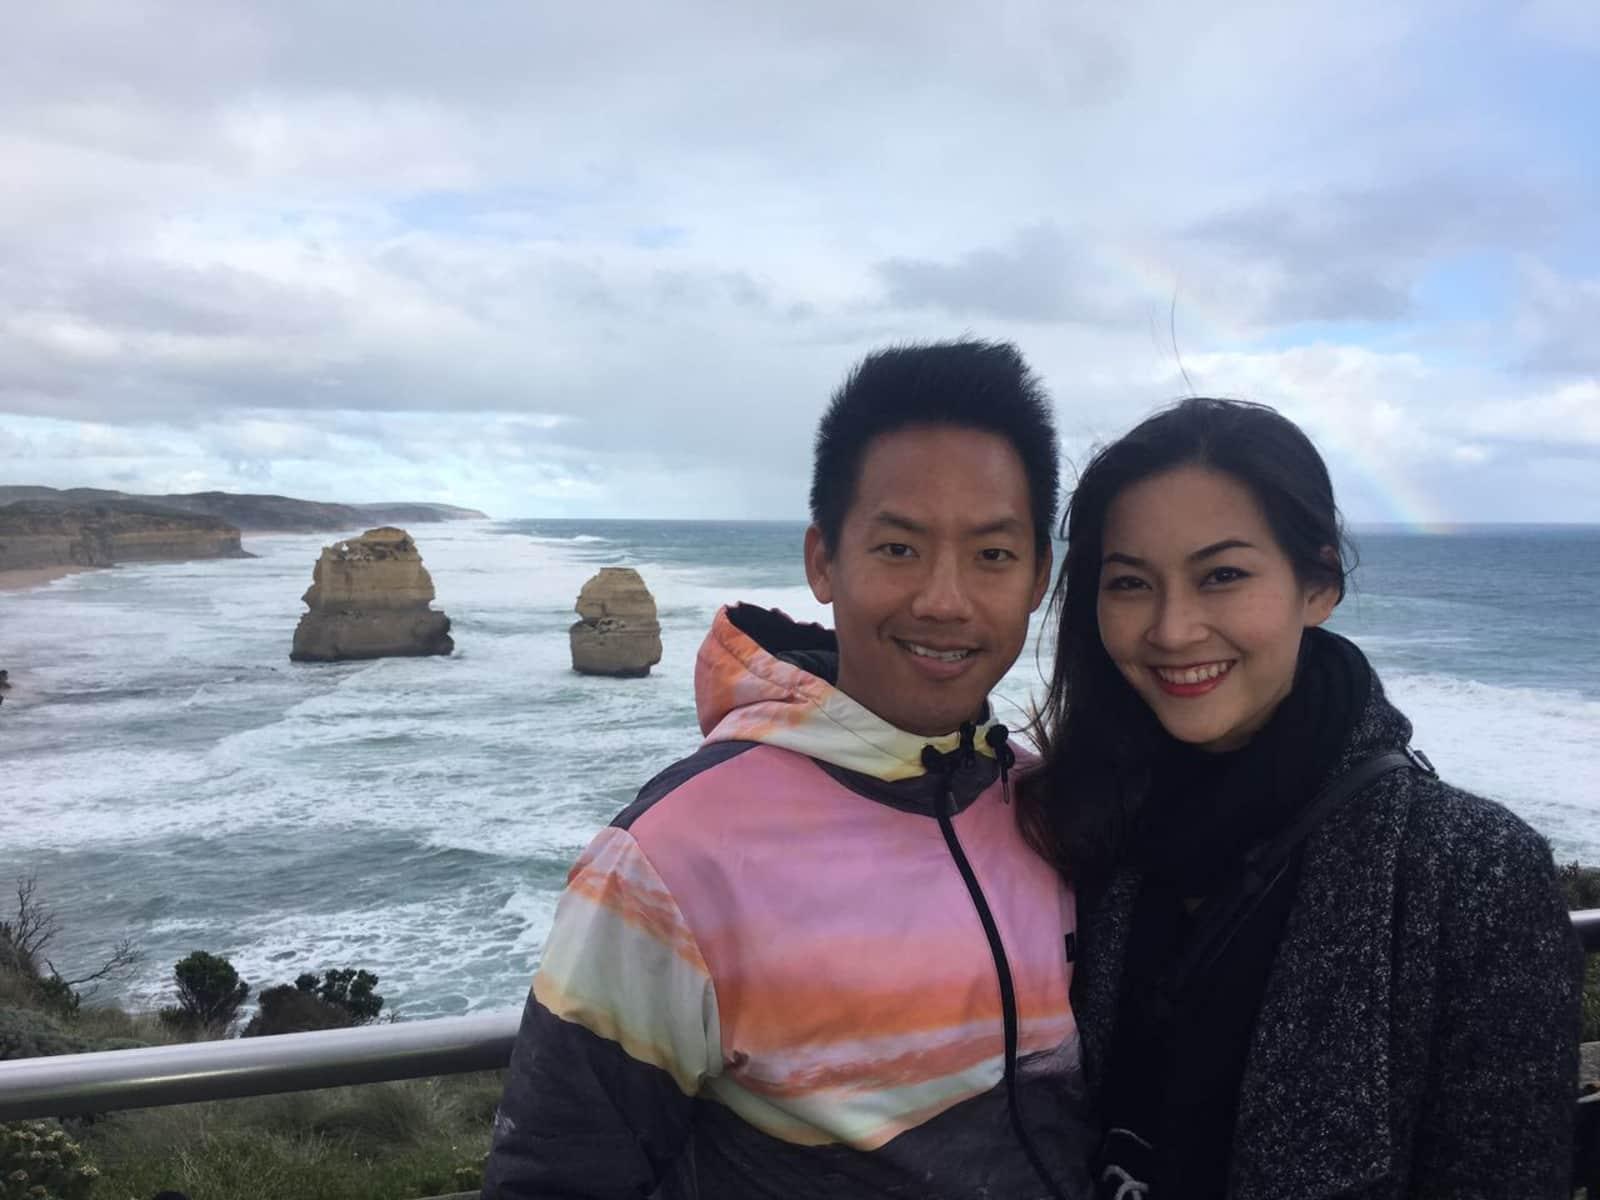 Josiah & Nattha from Melbourne, Victoria, Australia